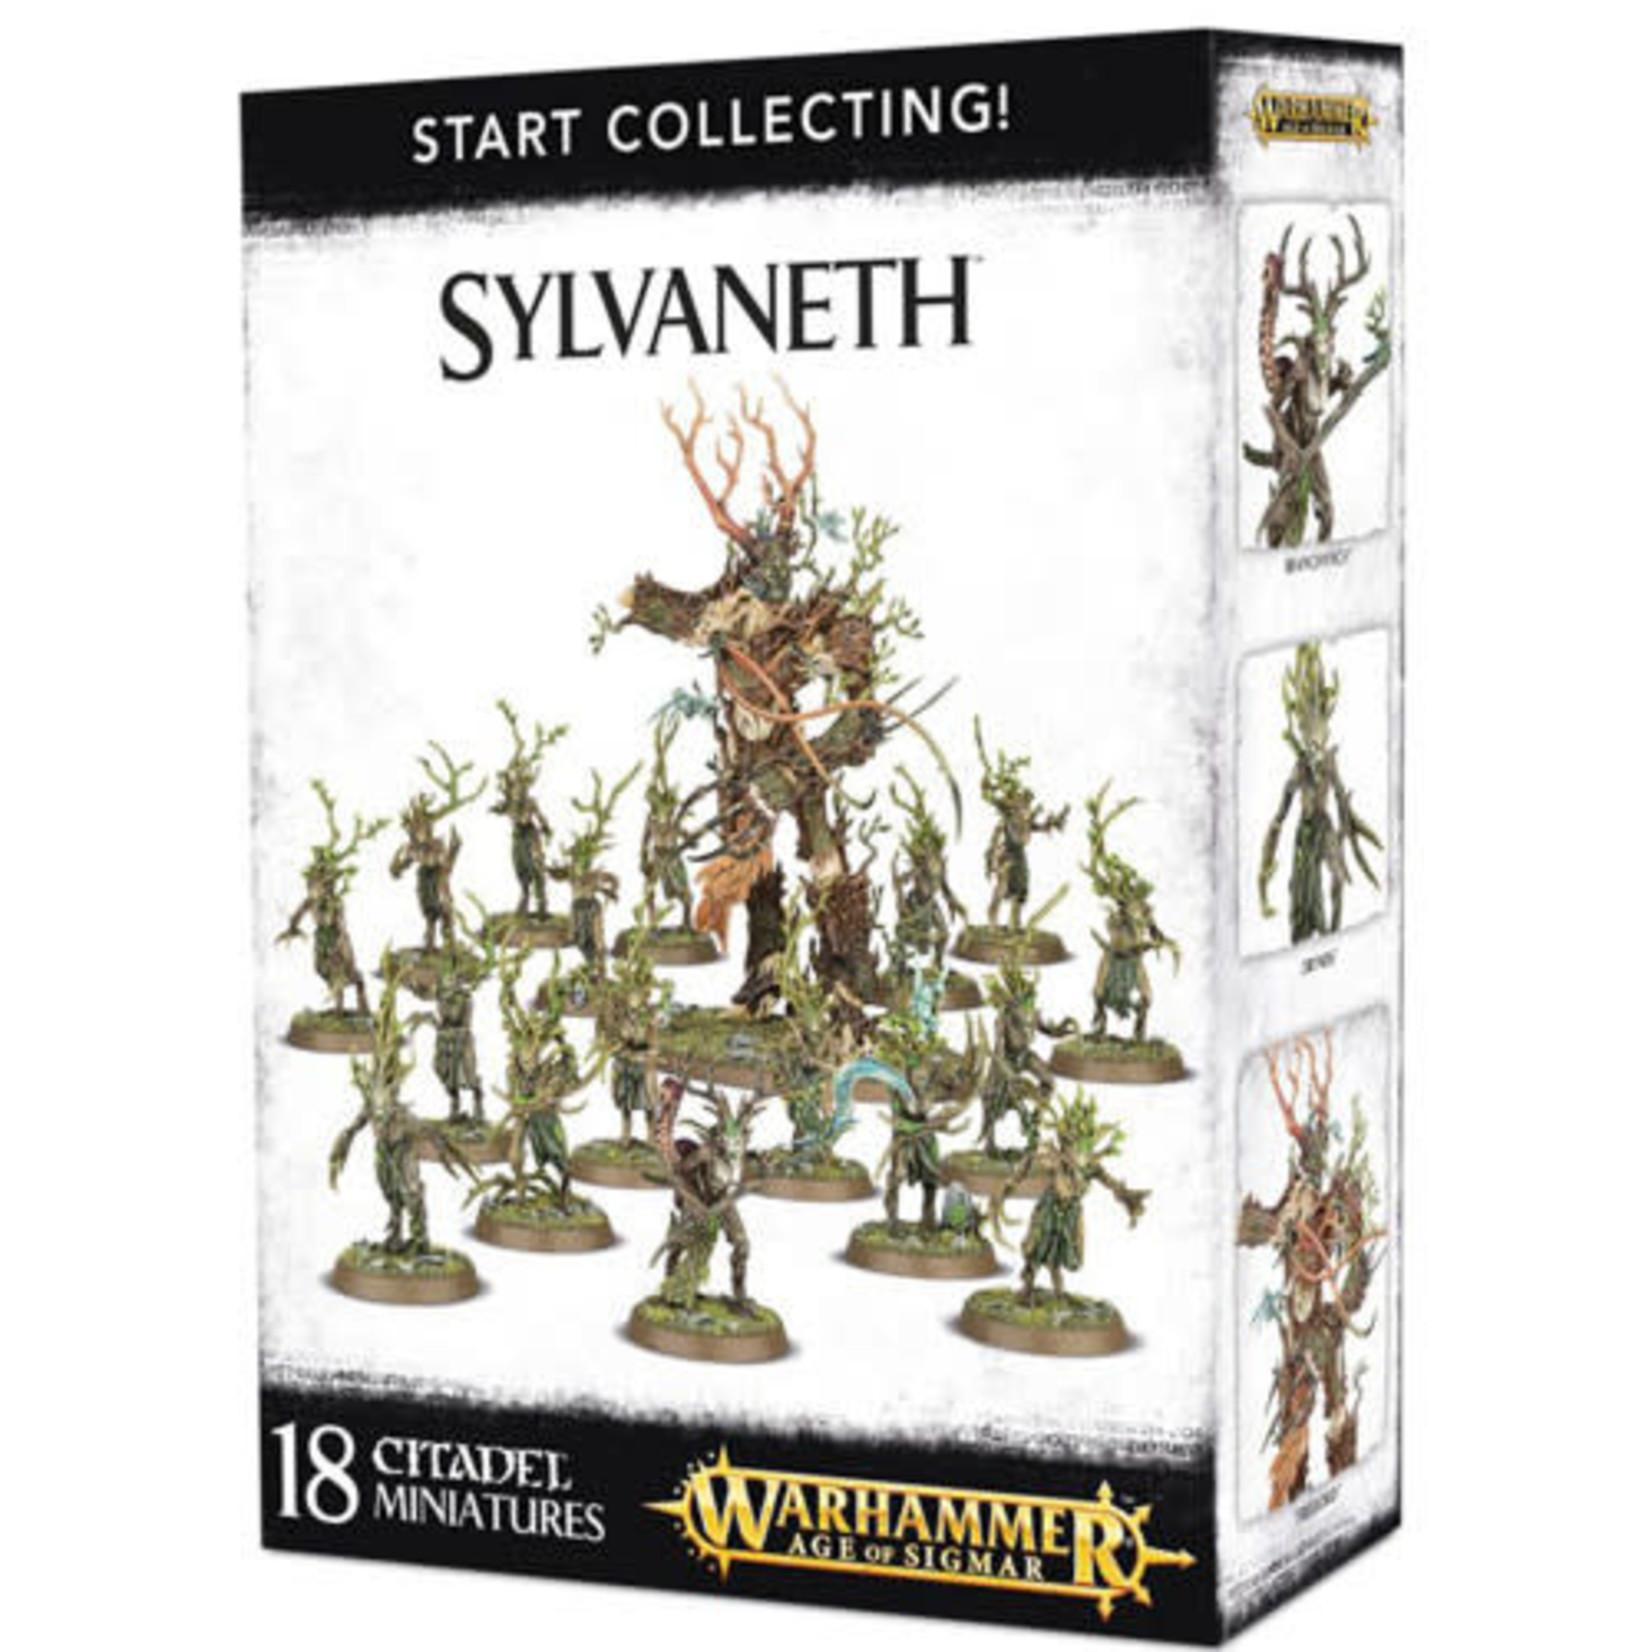 Games Workshop Warhammer Age of Sigmar: Start Collecting! Sylvaneth